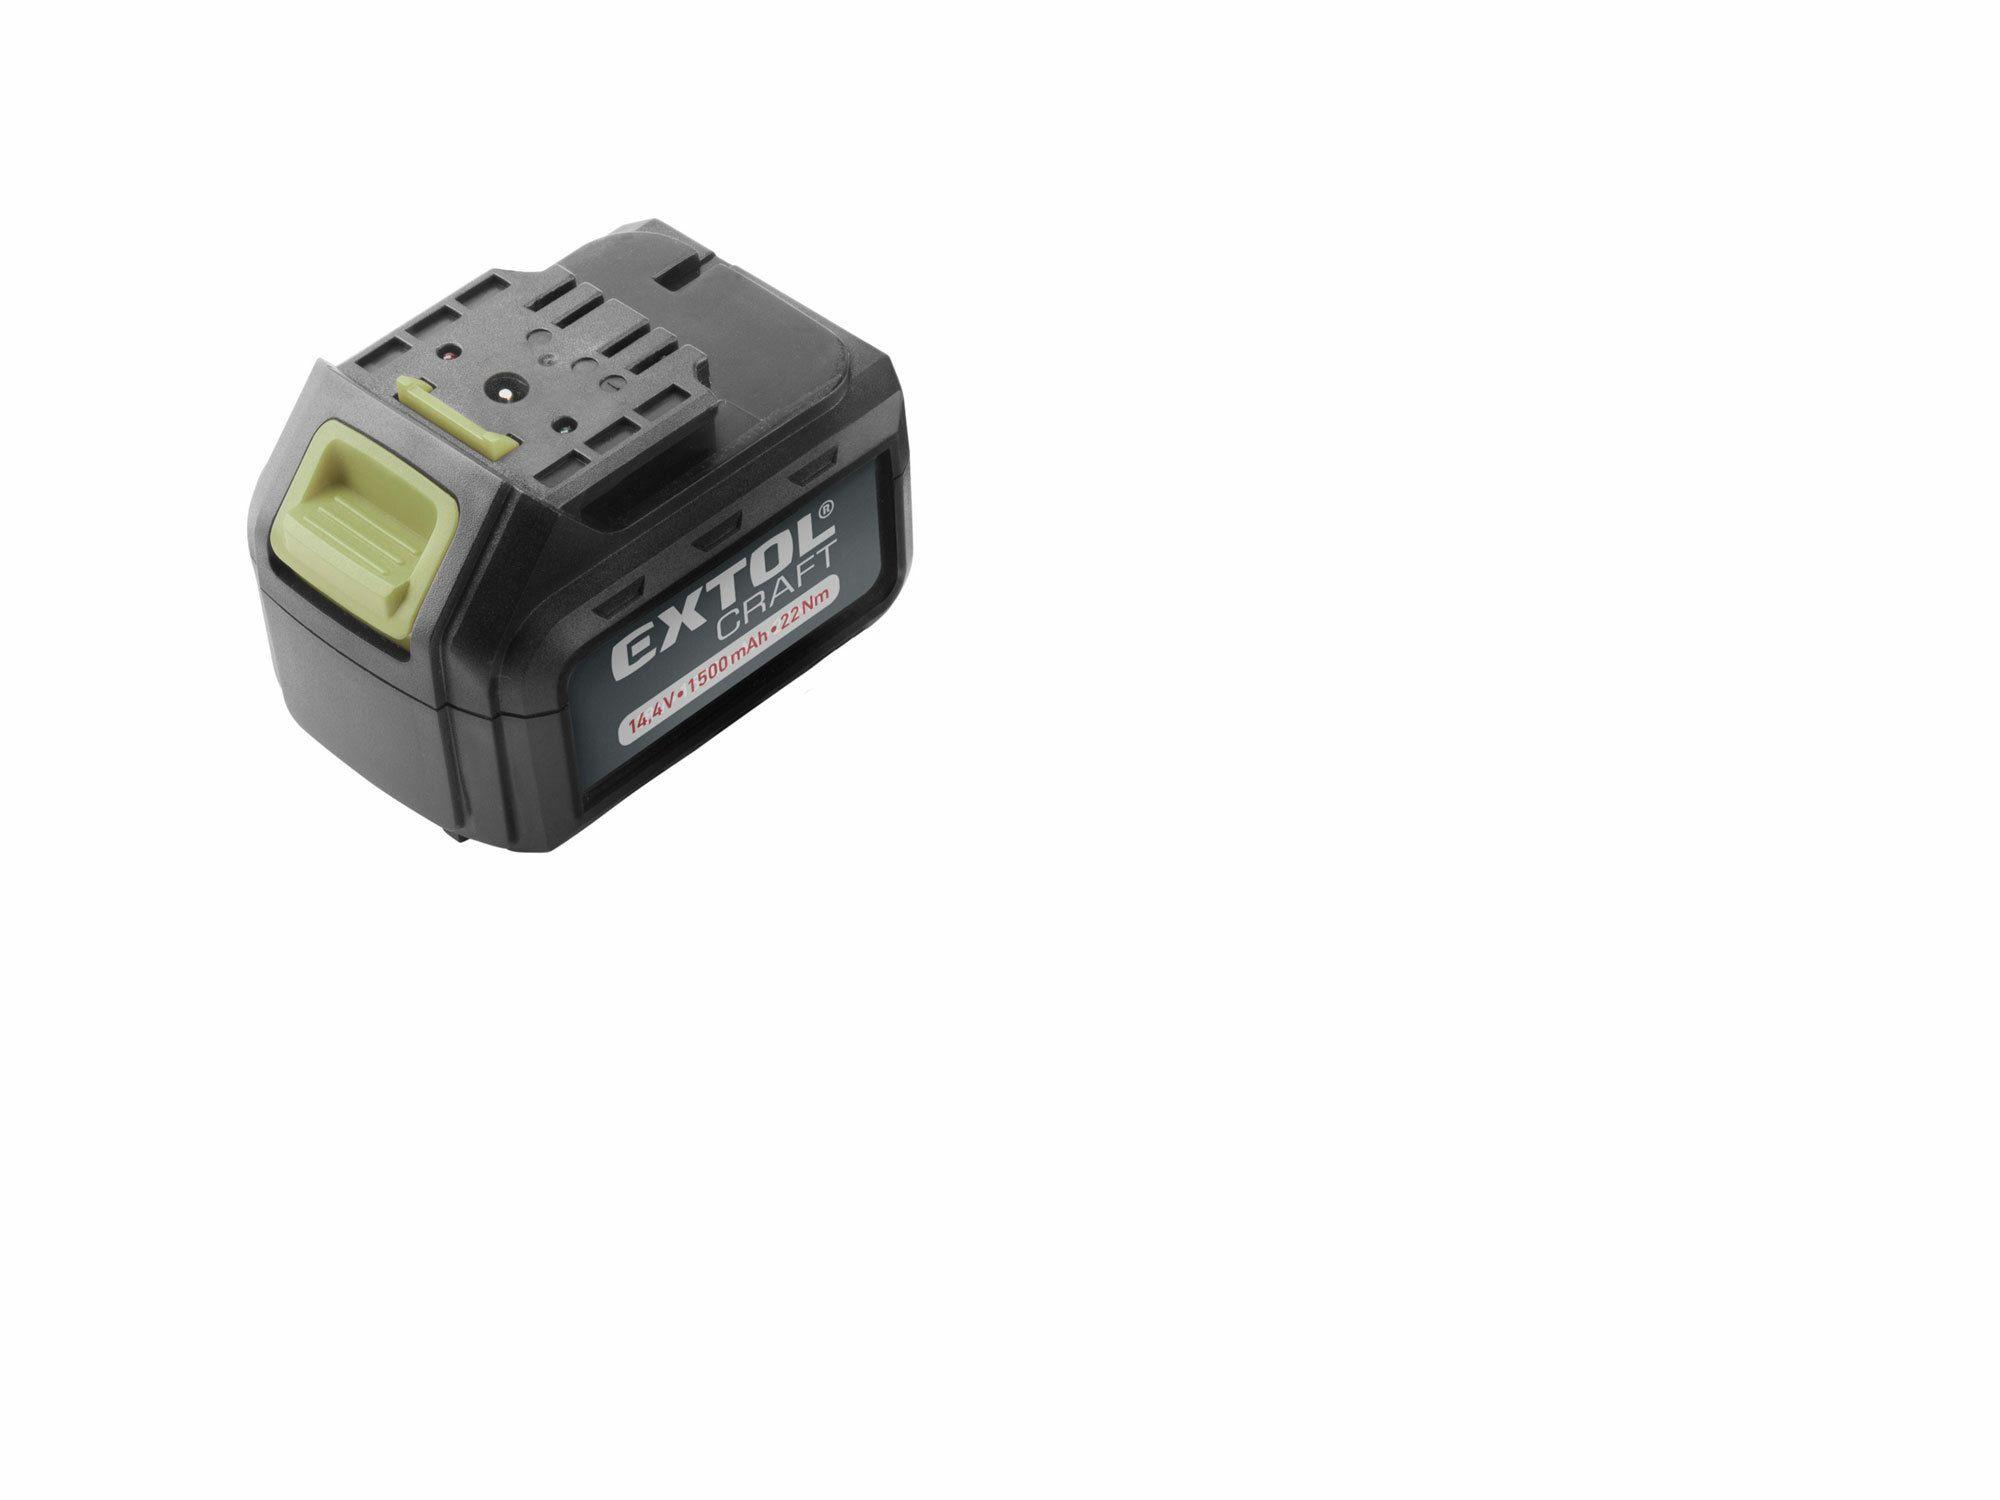 Baterie akumulátorová 14,4V, Li-ion, 1500mAh, EXTOL CRAFT